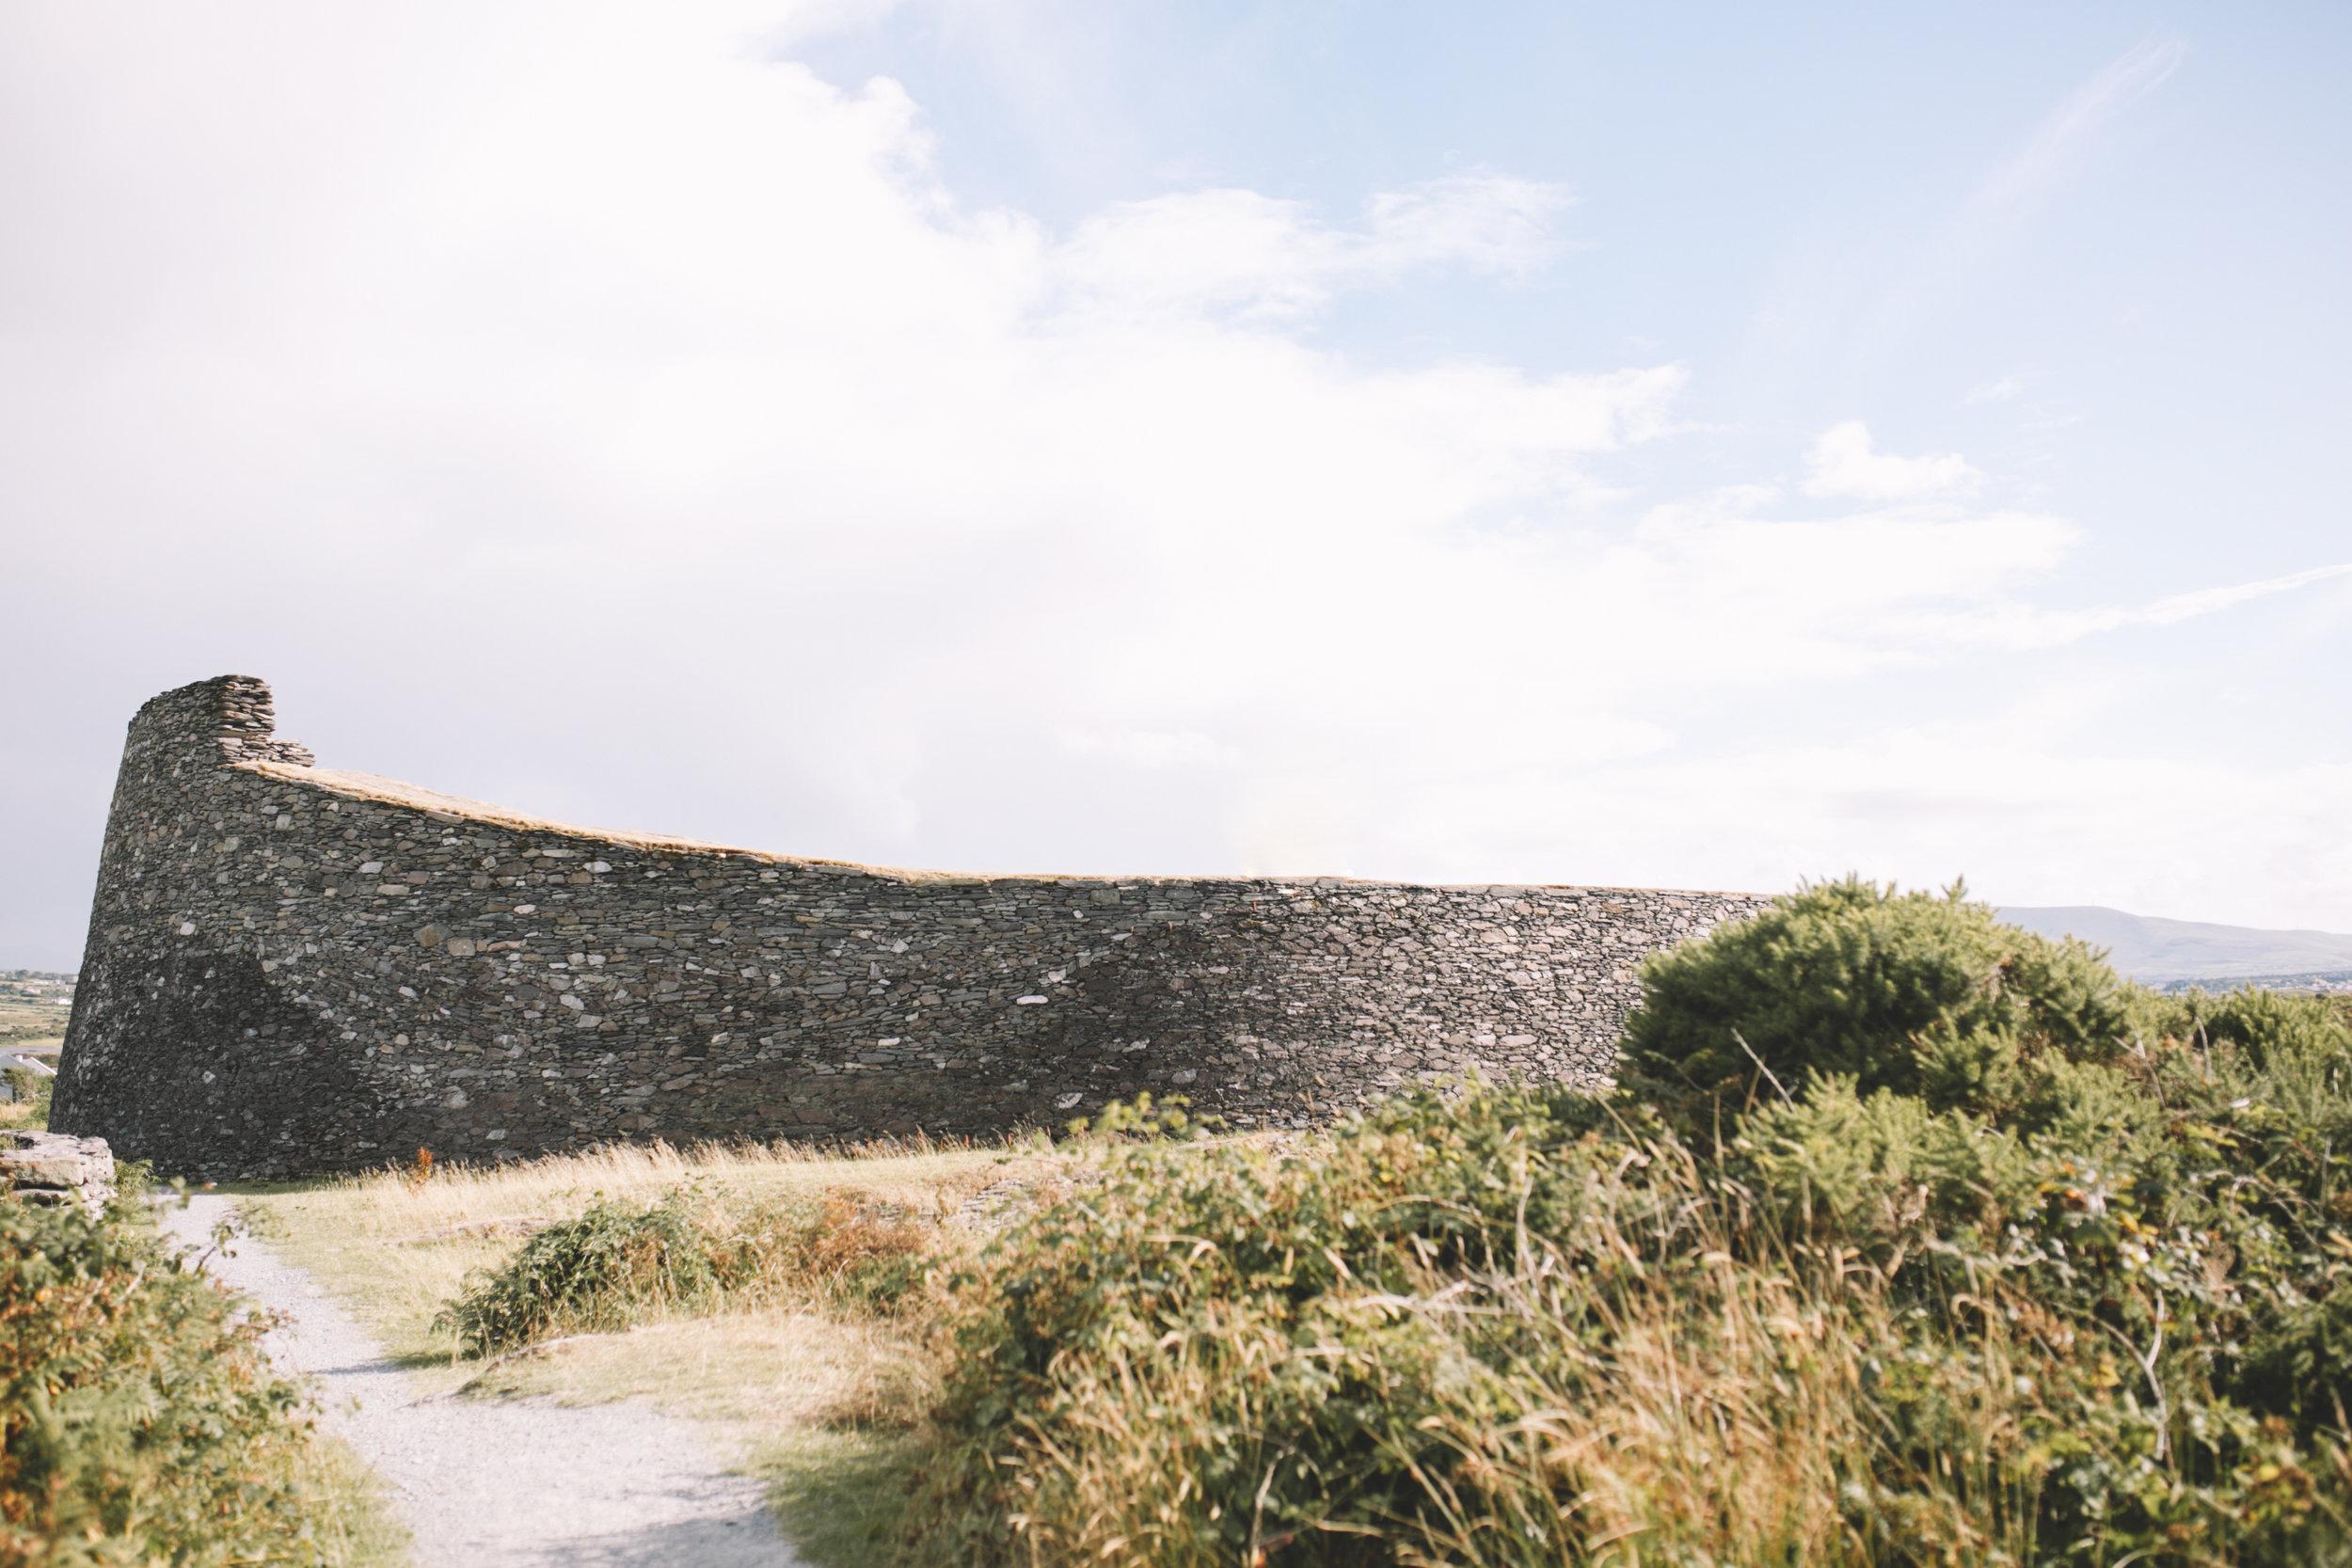 10 Tear Anniversary Trip - Ballinskelligs Ireland + Castle  (59 of 197).jpg